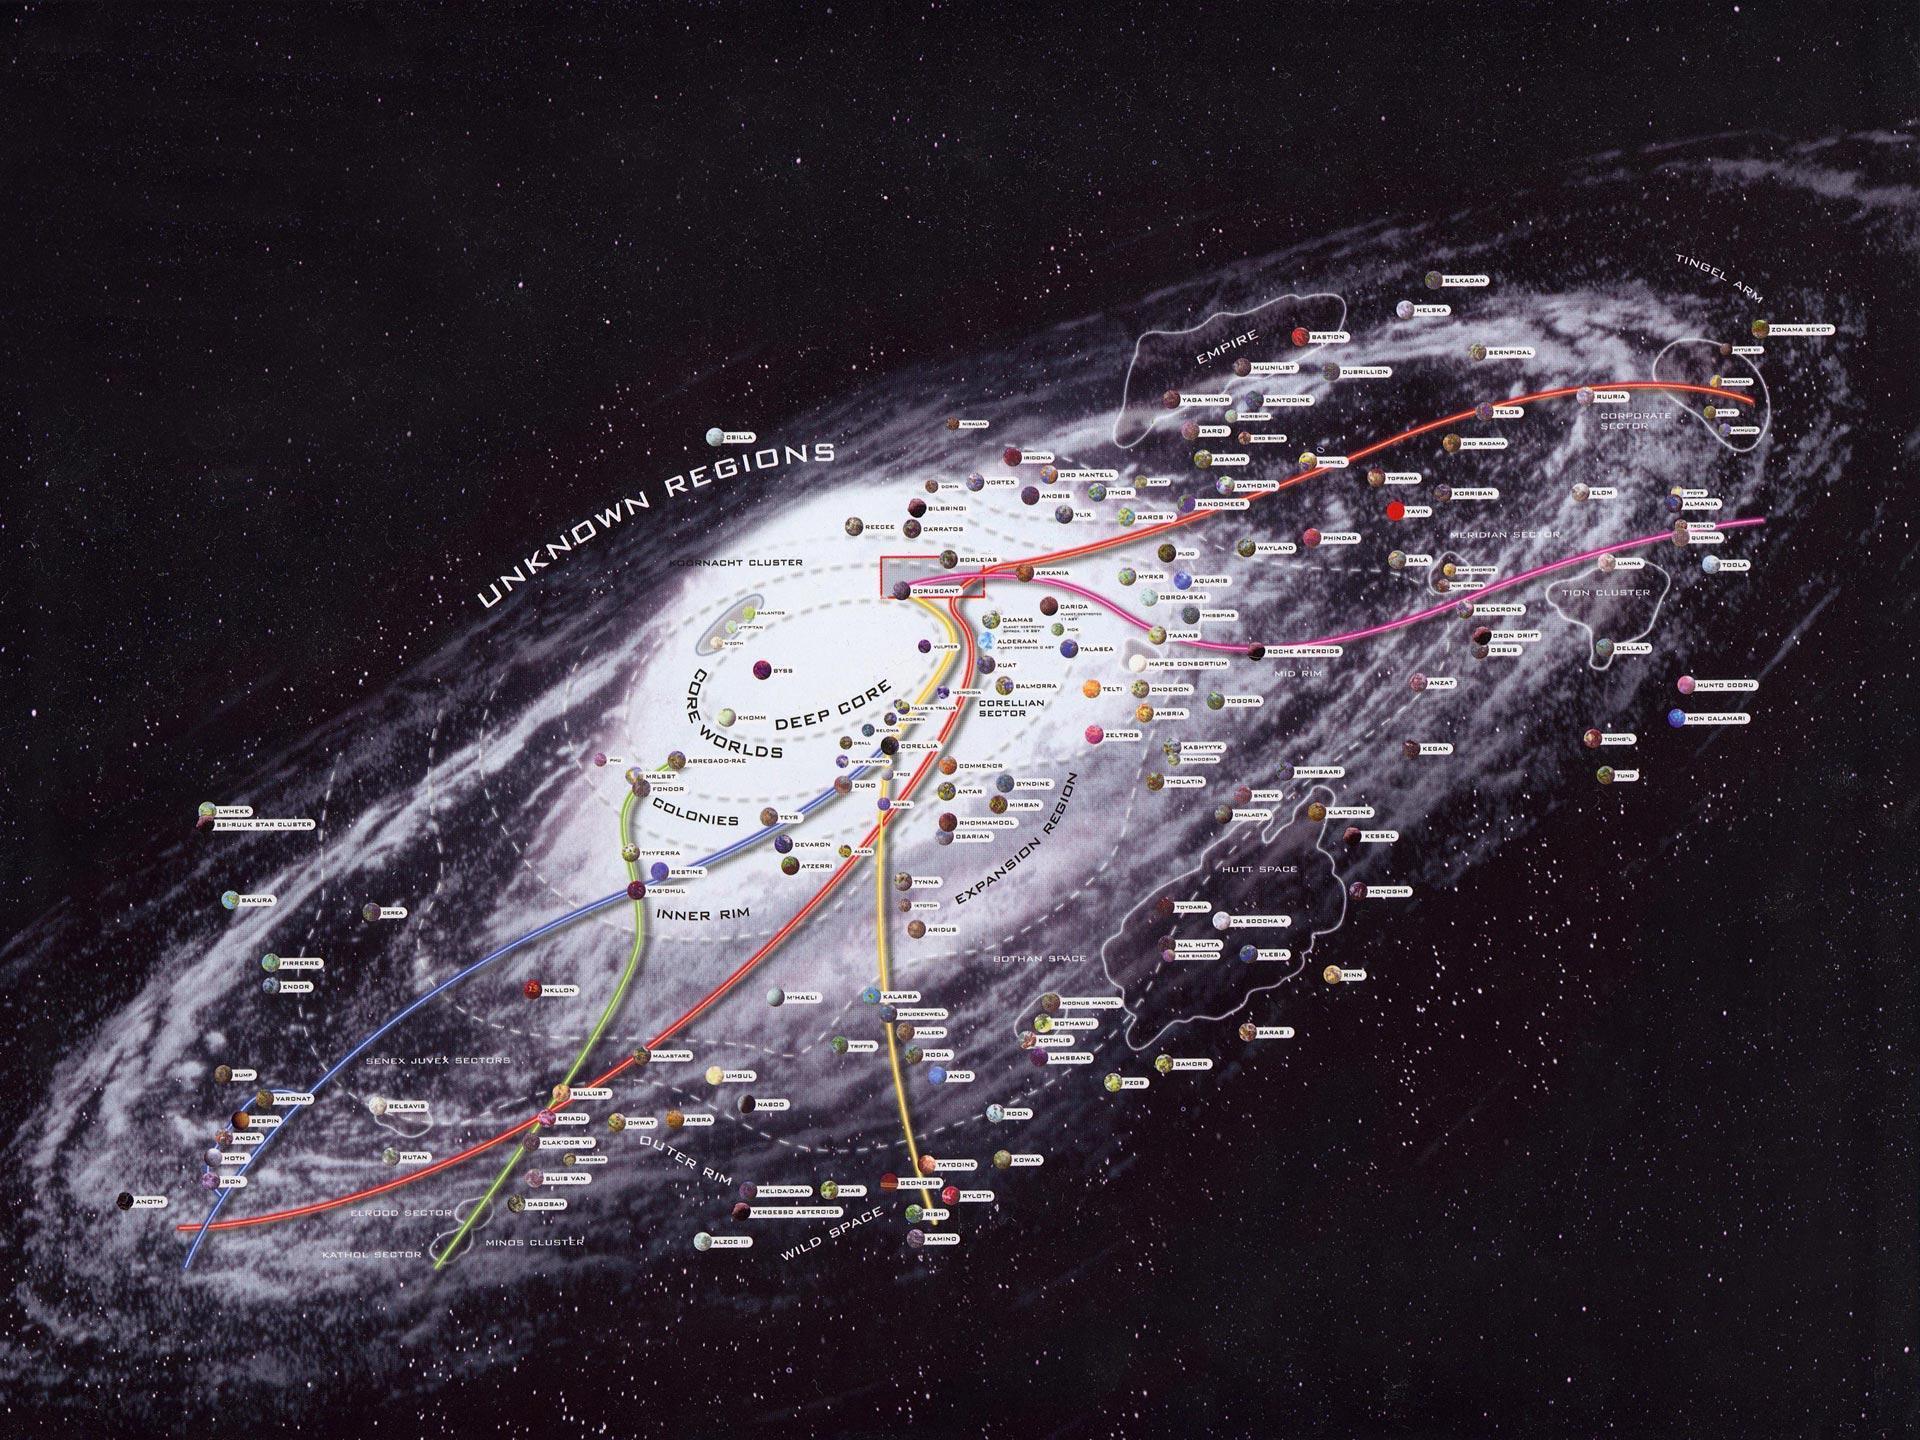 Star Wars Karte.Star Wars Die Klonkriege